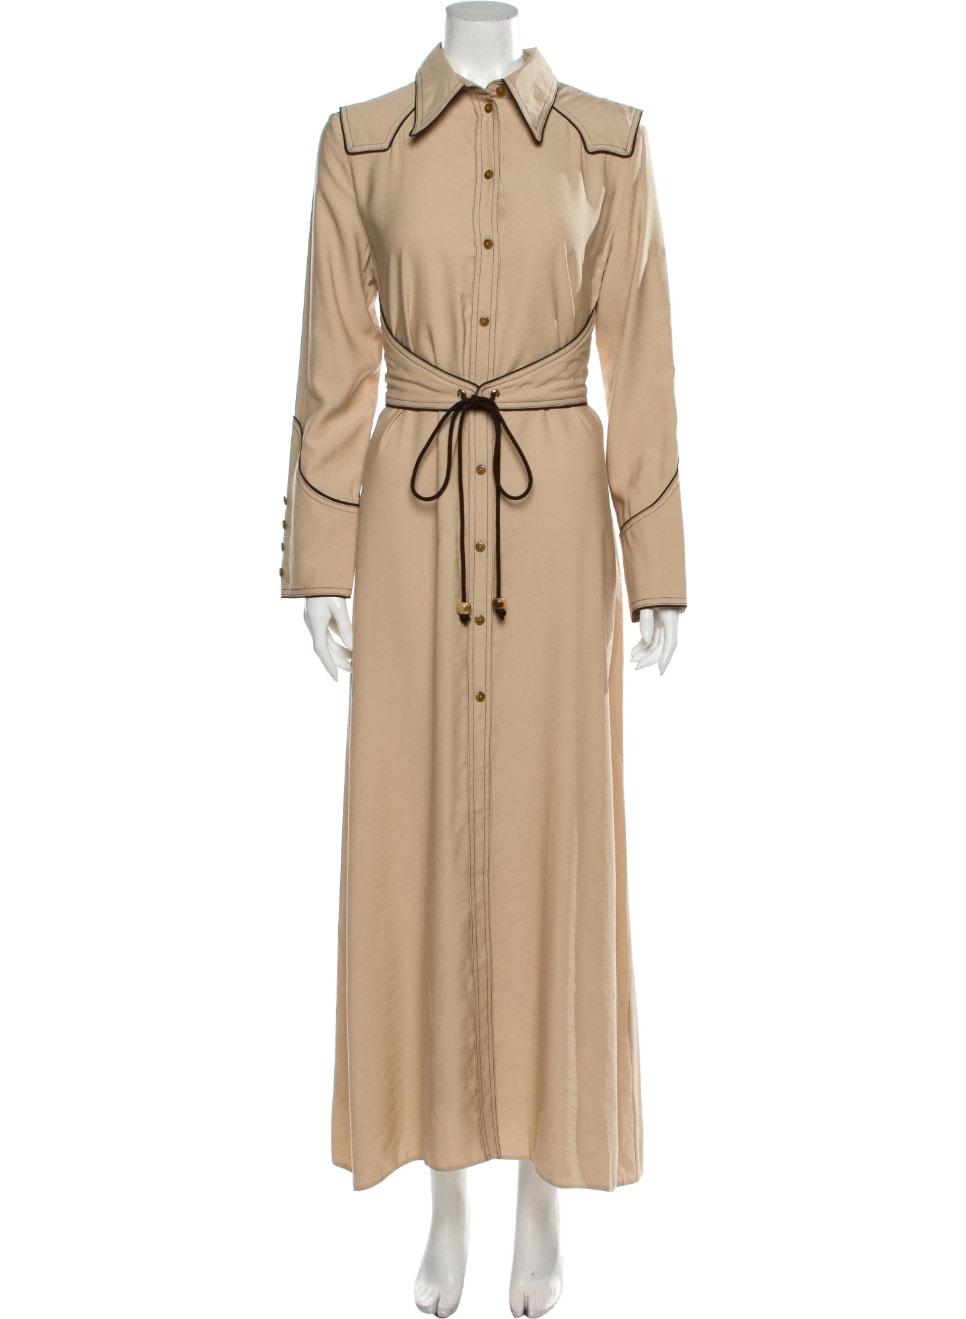 2019 Long Dress